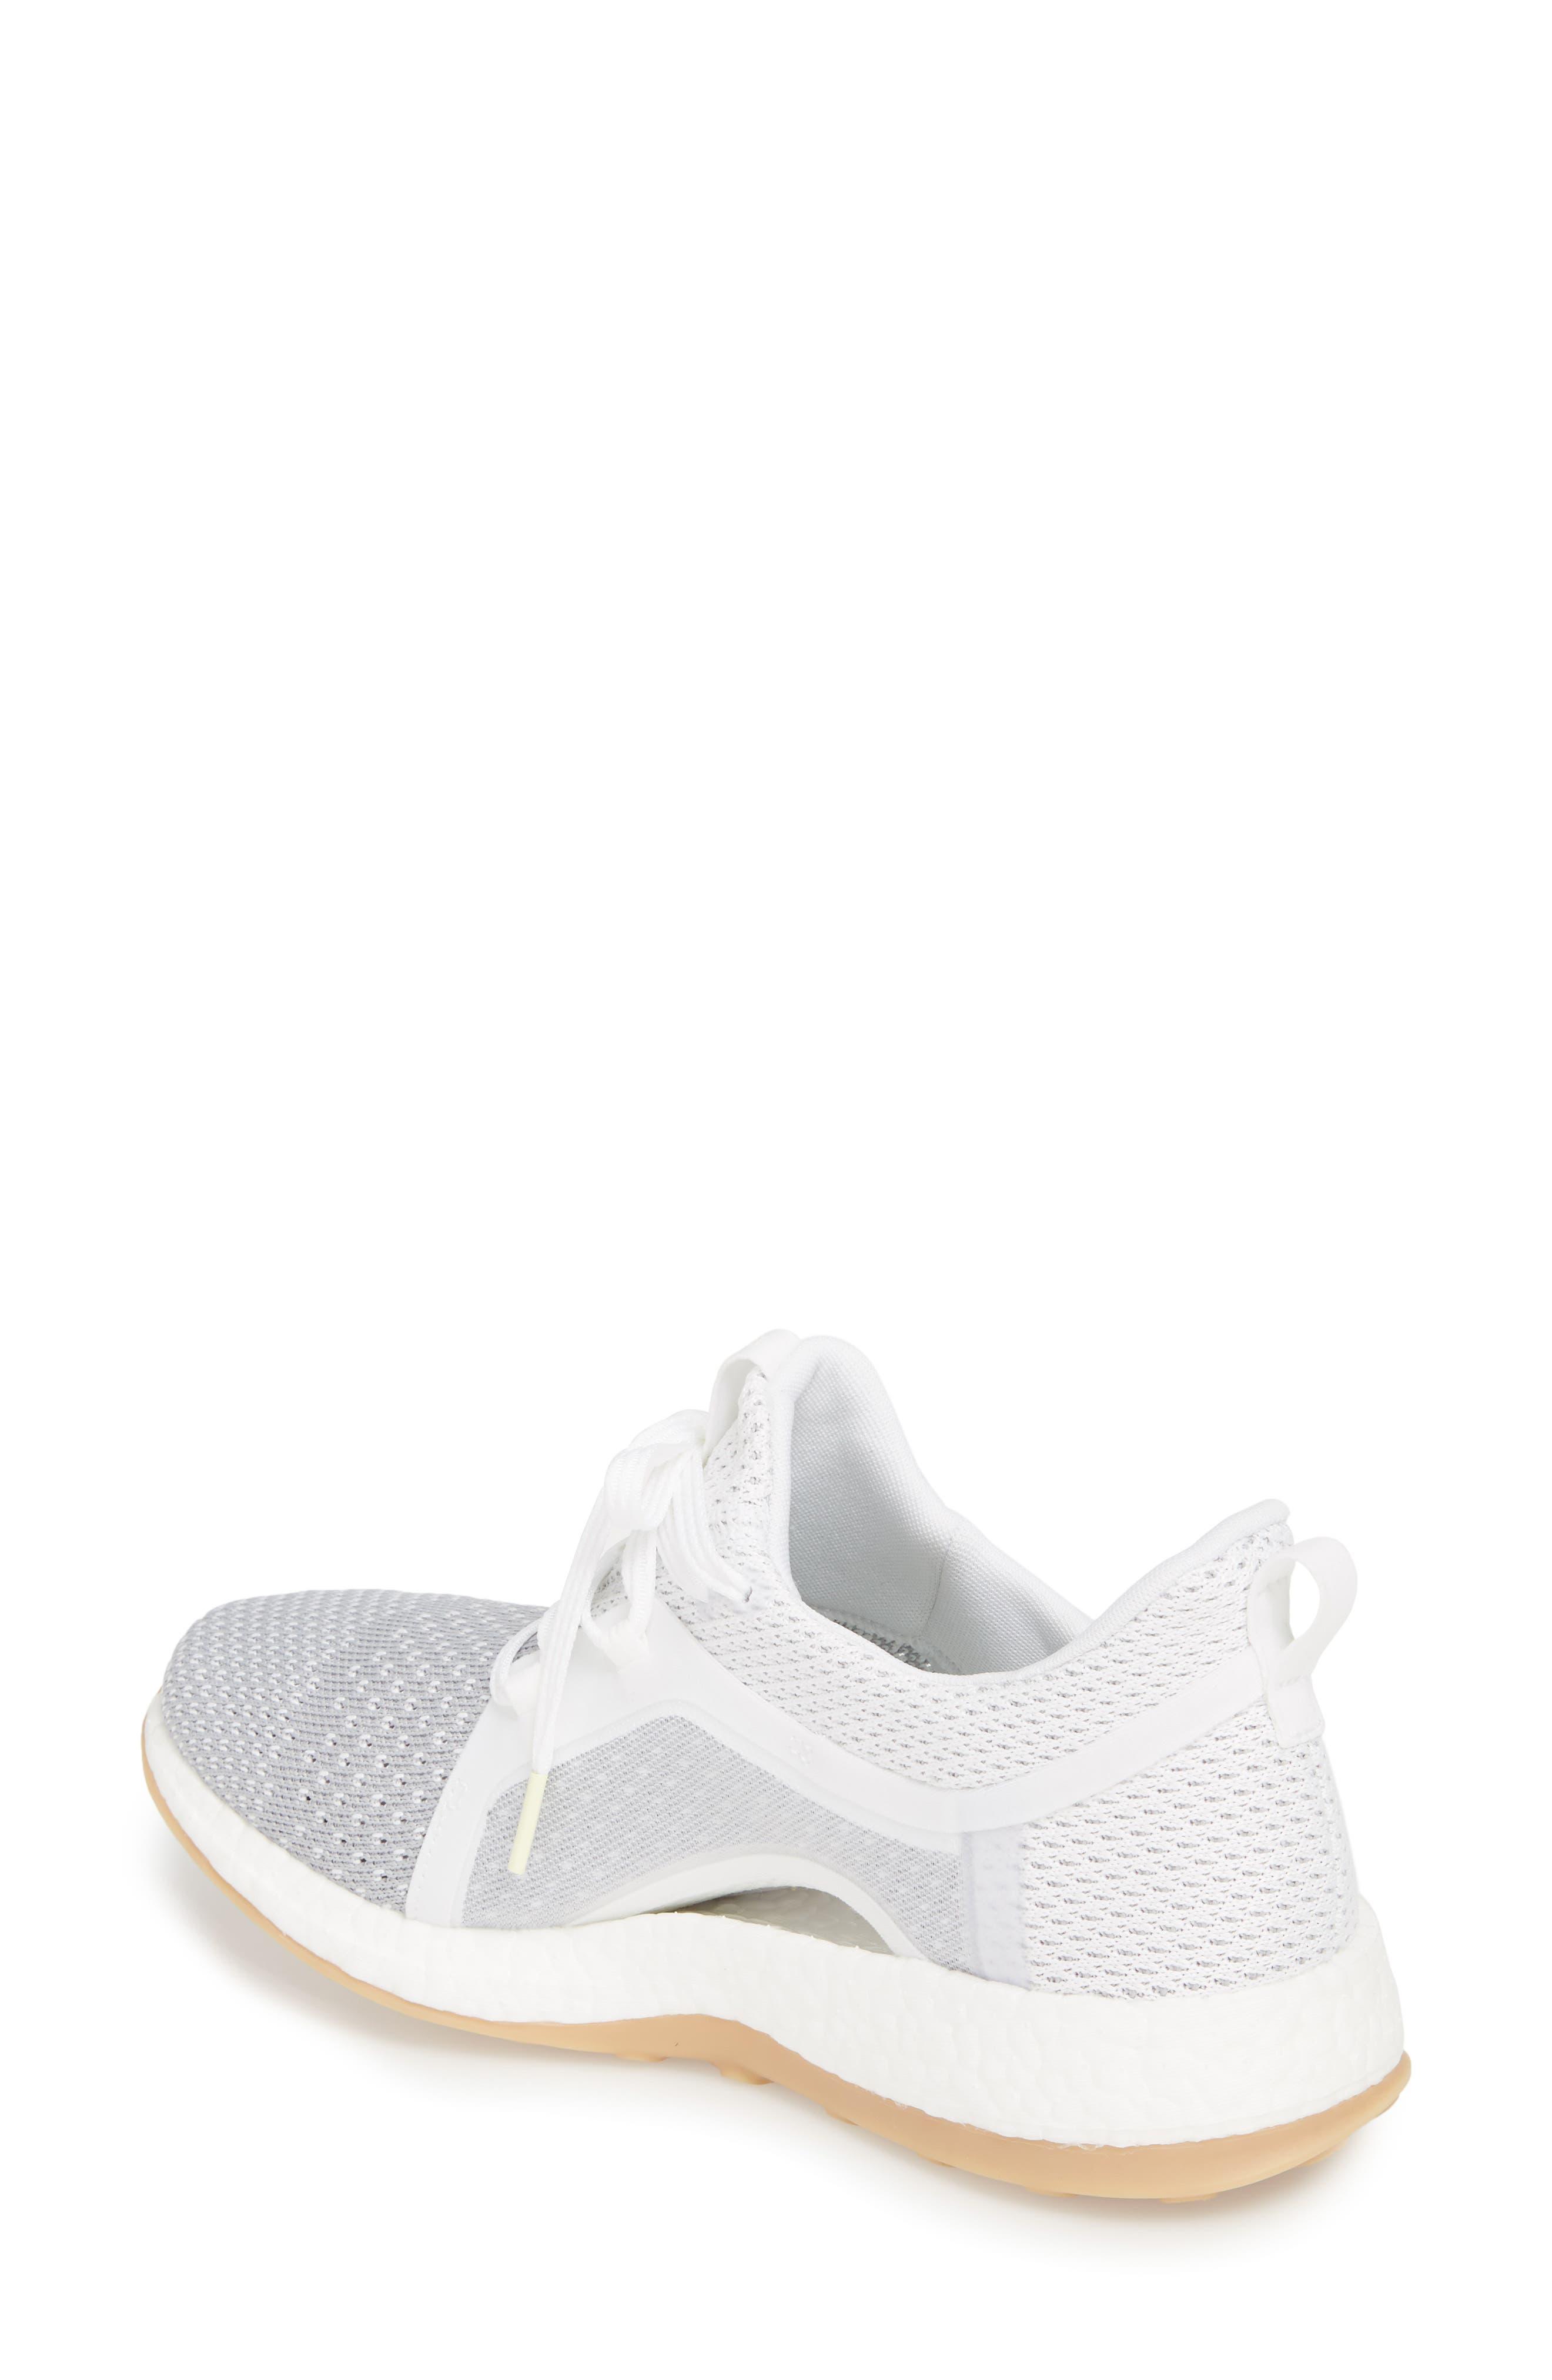 Pureboost X Clima Sneaker,                             Alternate thumbnail 2, color,                             White/ Silver/ Grey